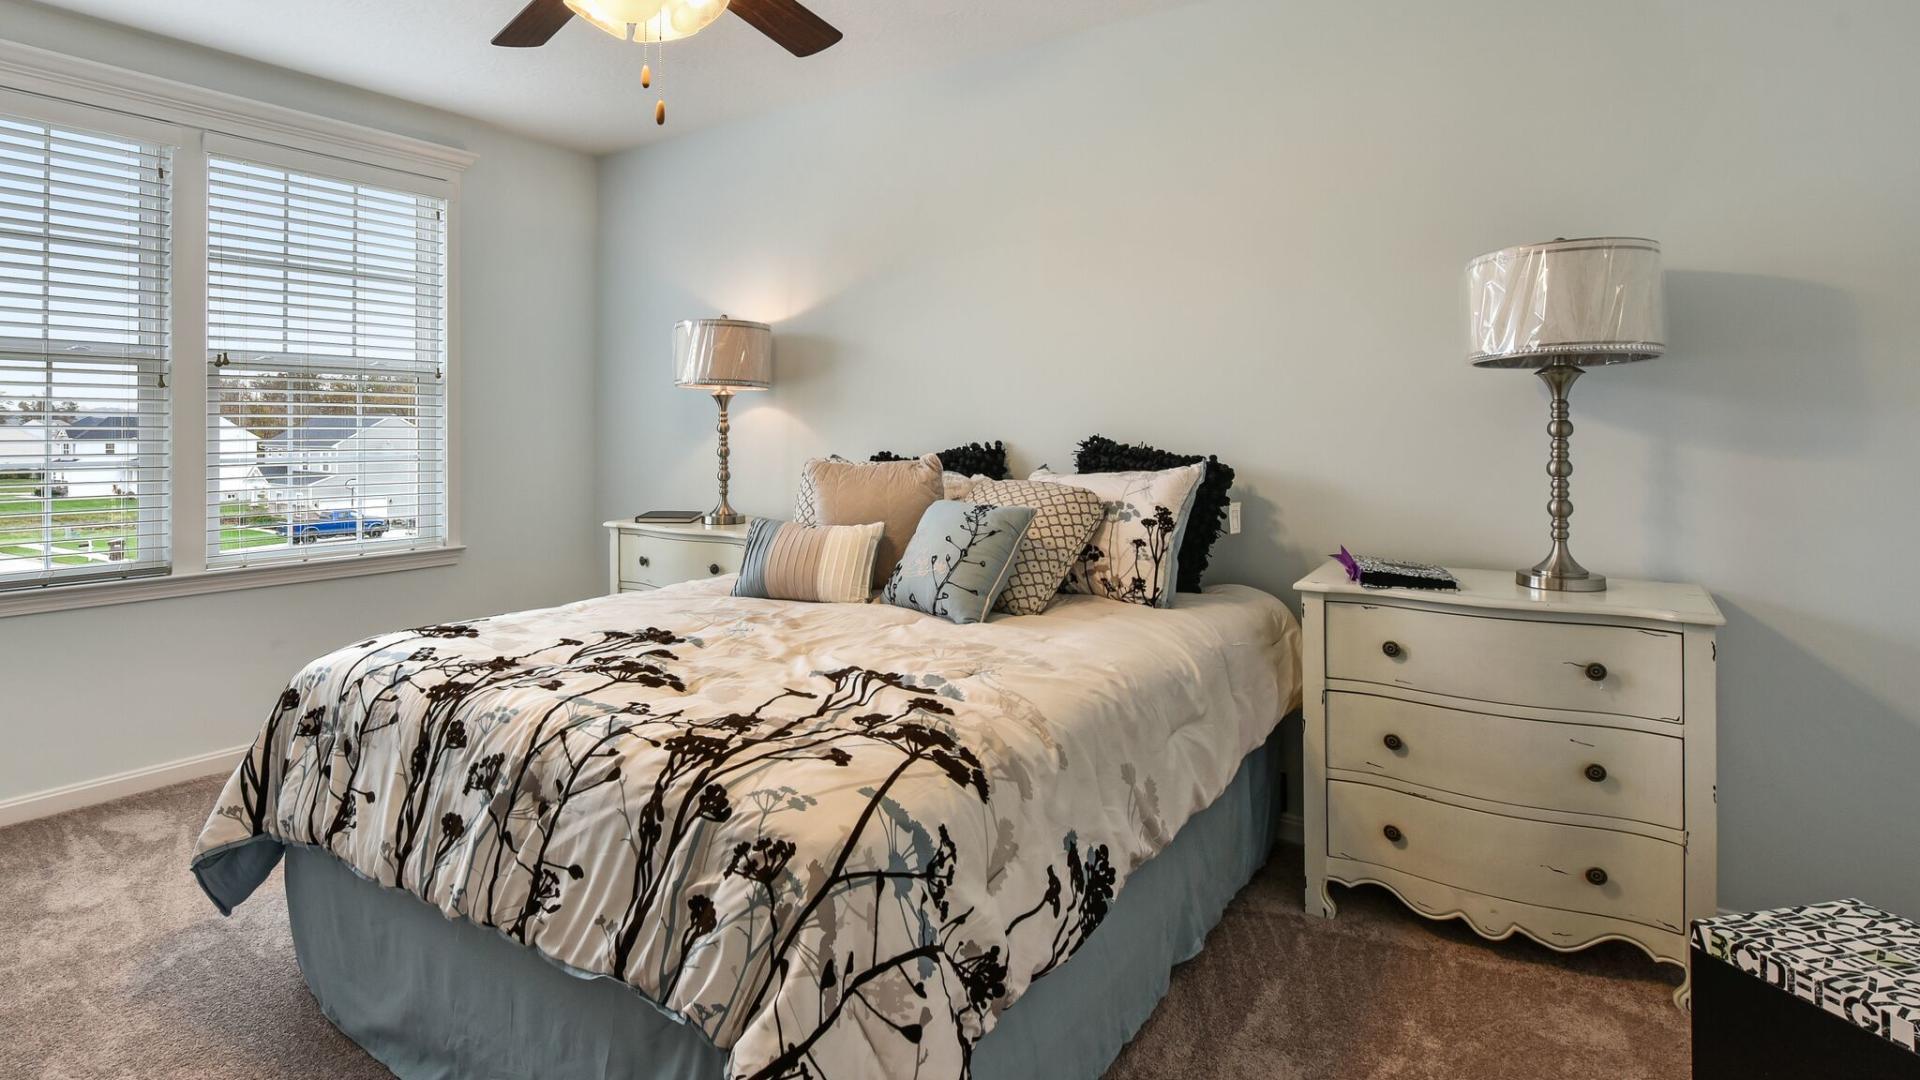 Bedroom featured in the Birmingham By Maronda Homes in Cincinnati, OH